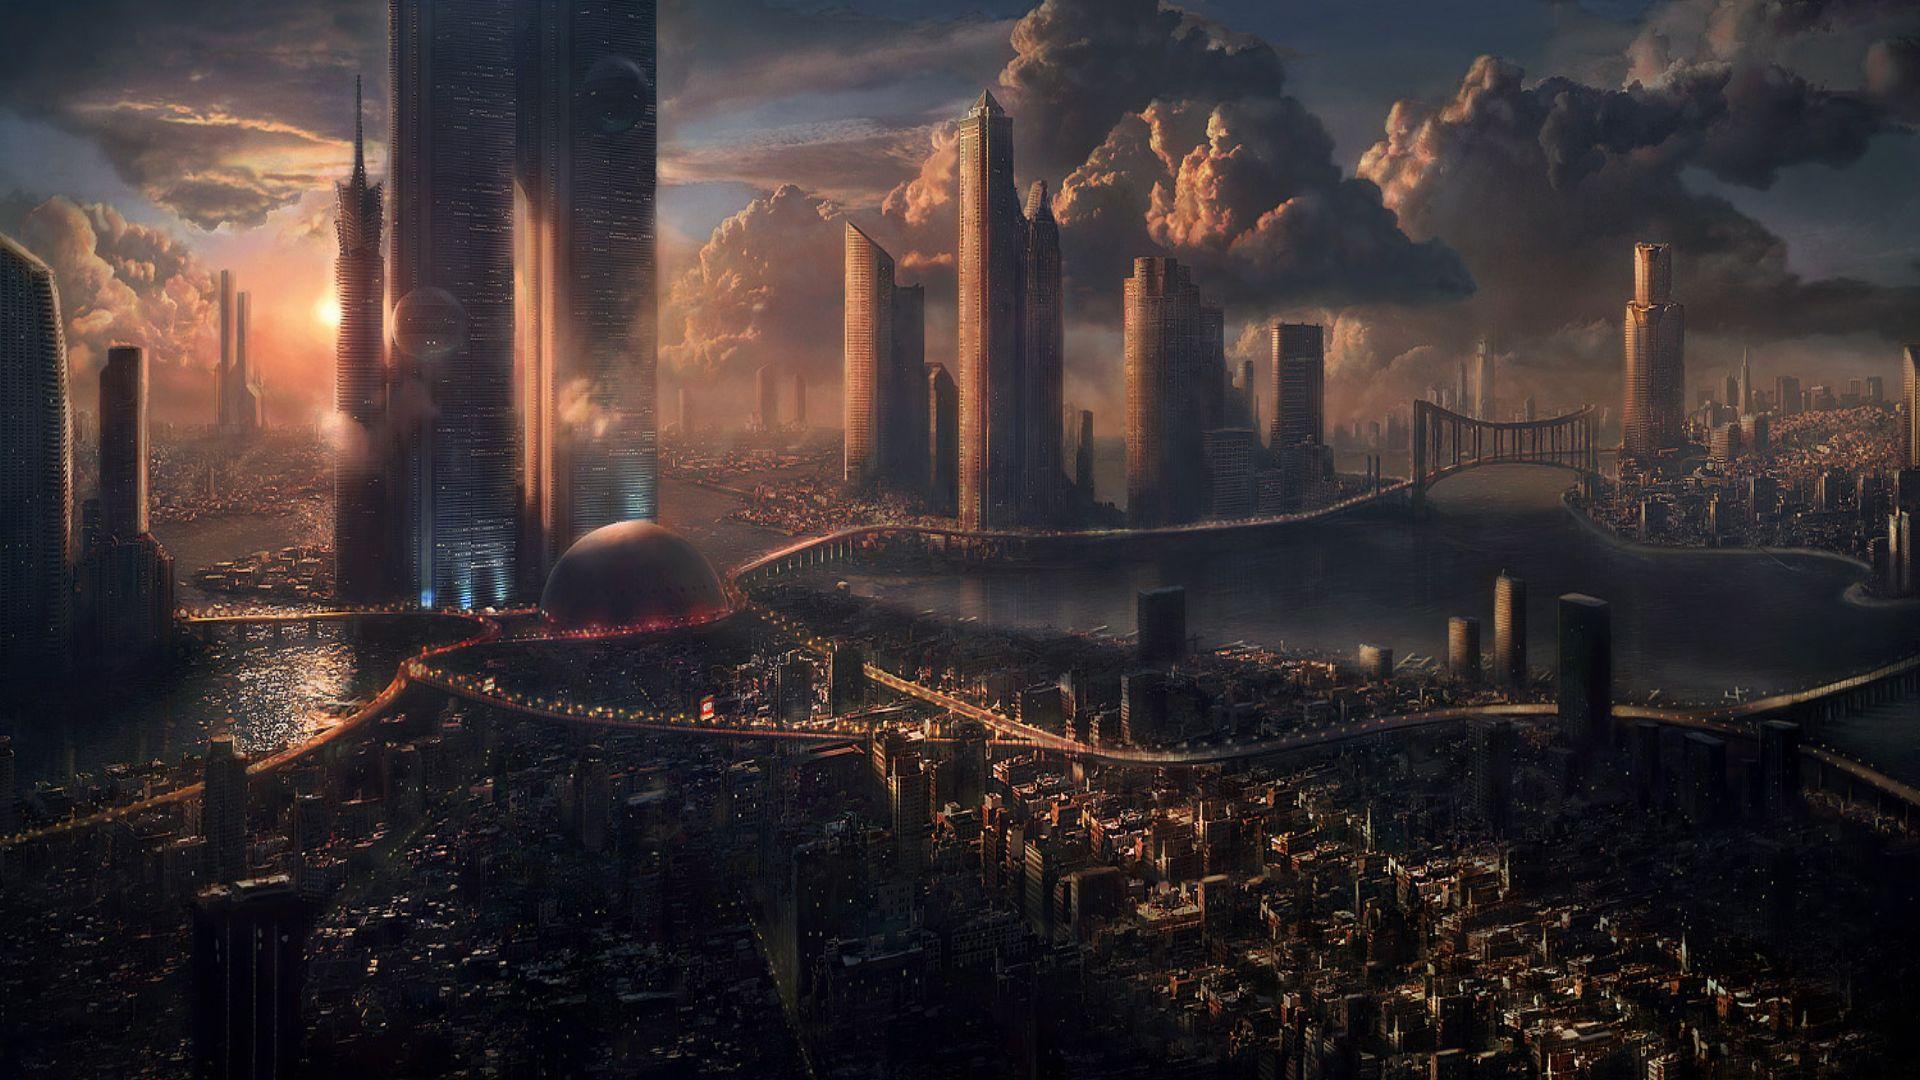 Sci Fi   City Towers Sci Fi Sunset Wallpaper 1920x1080